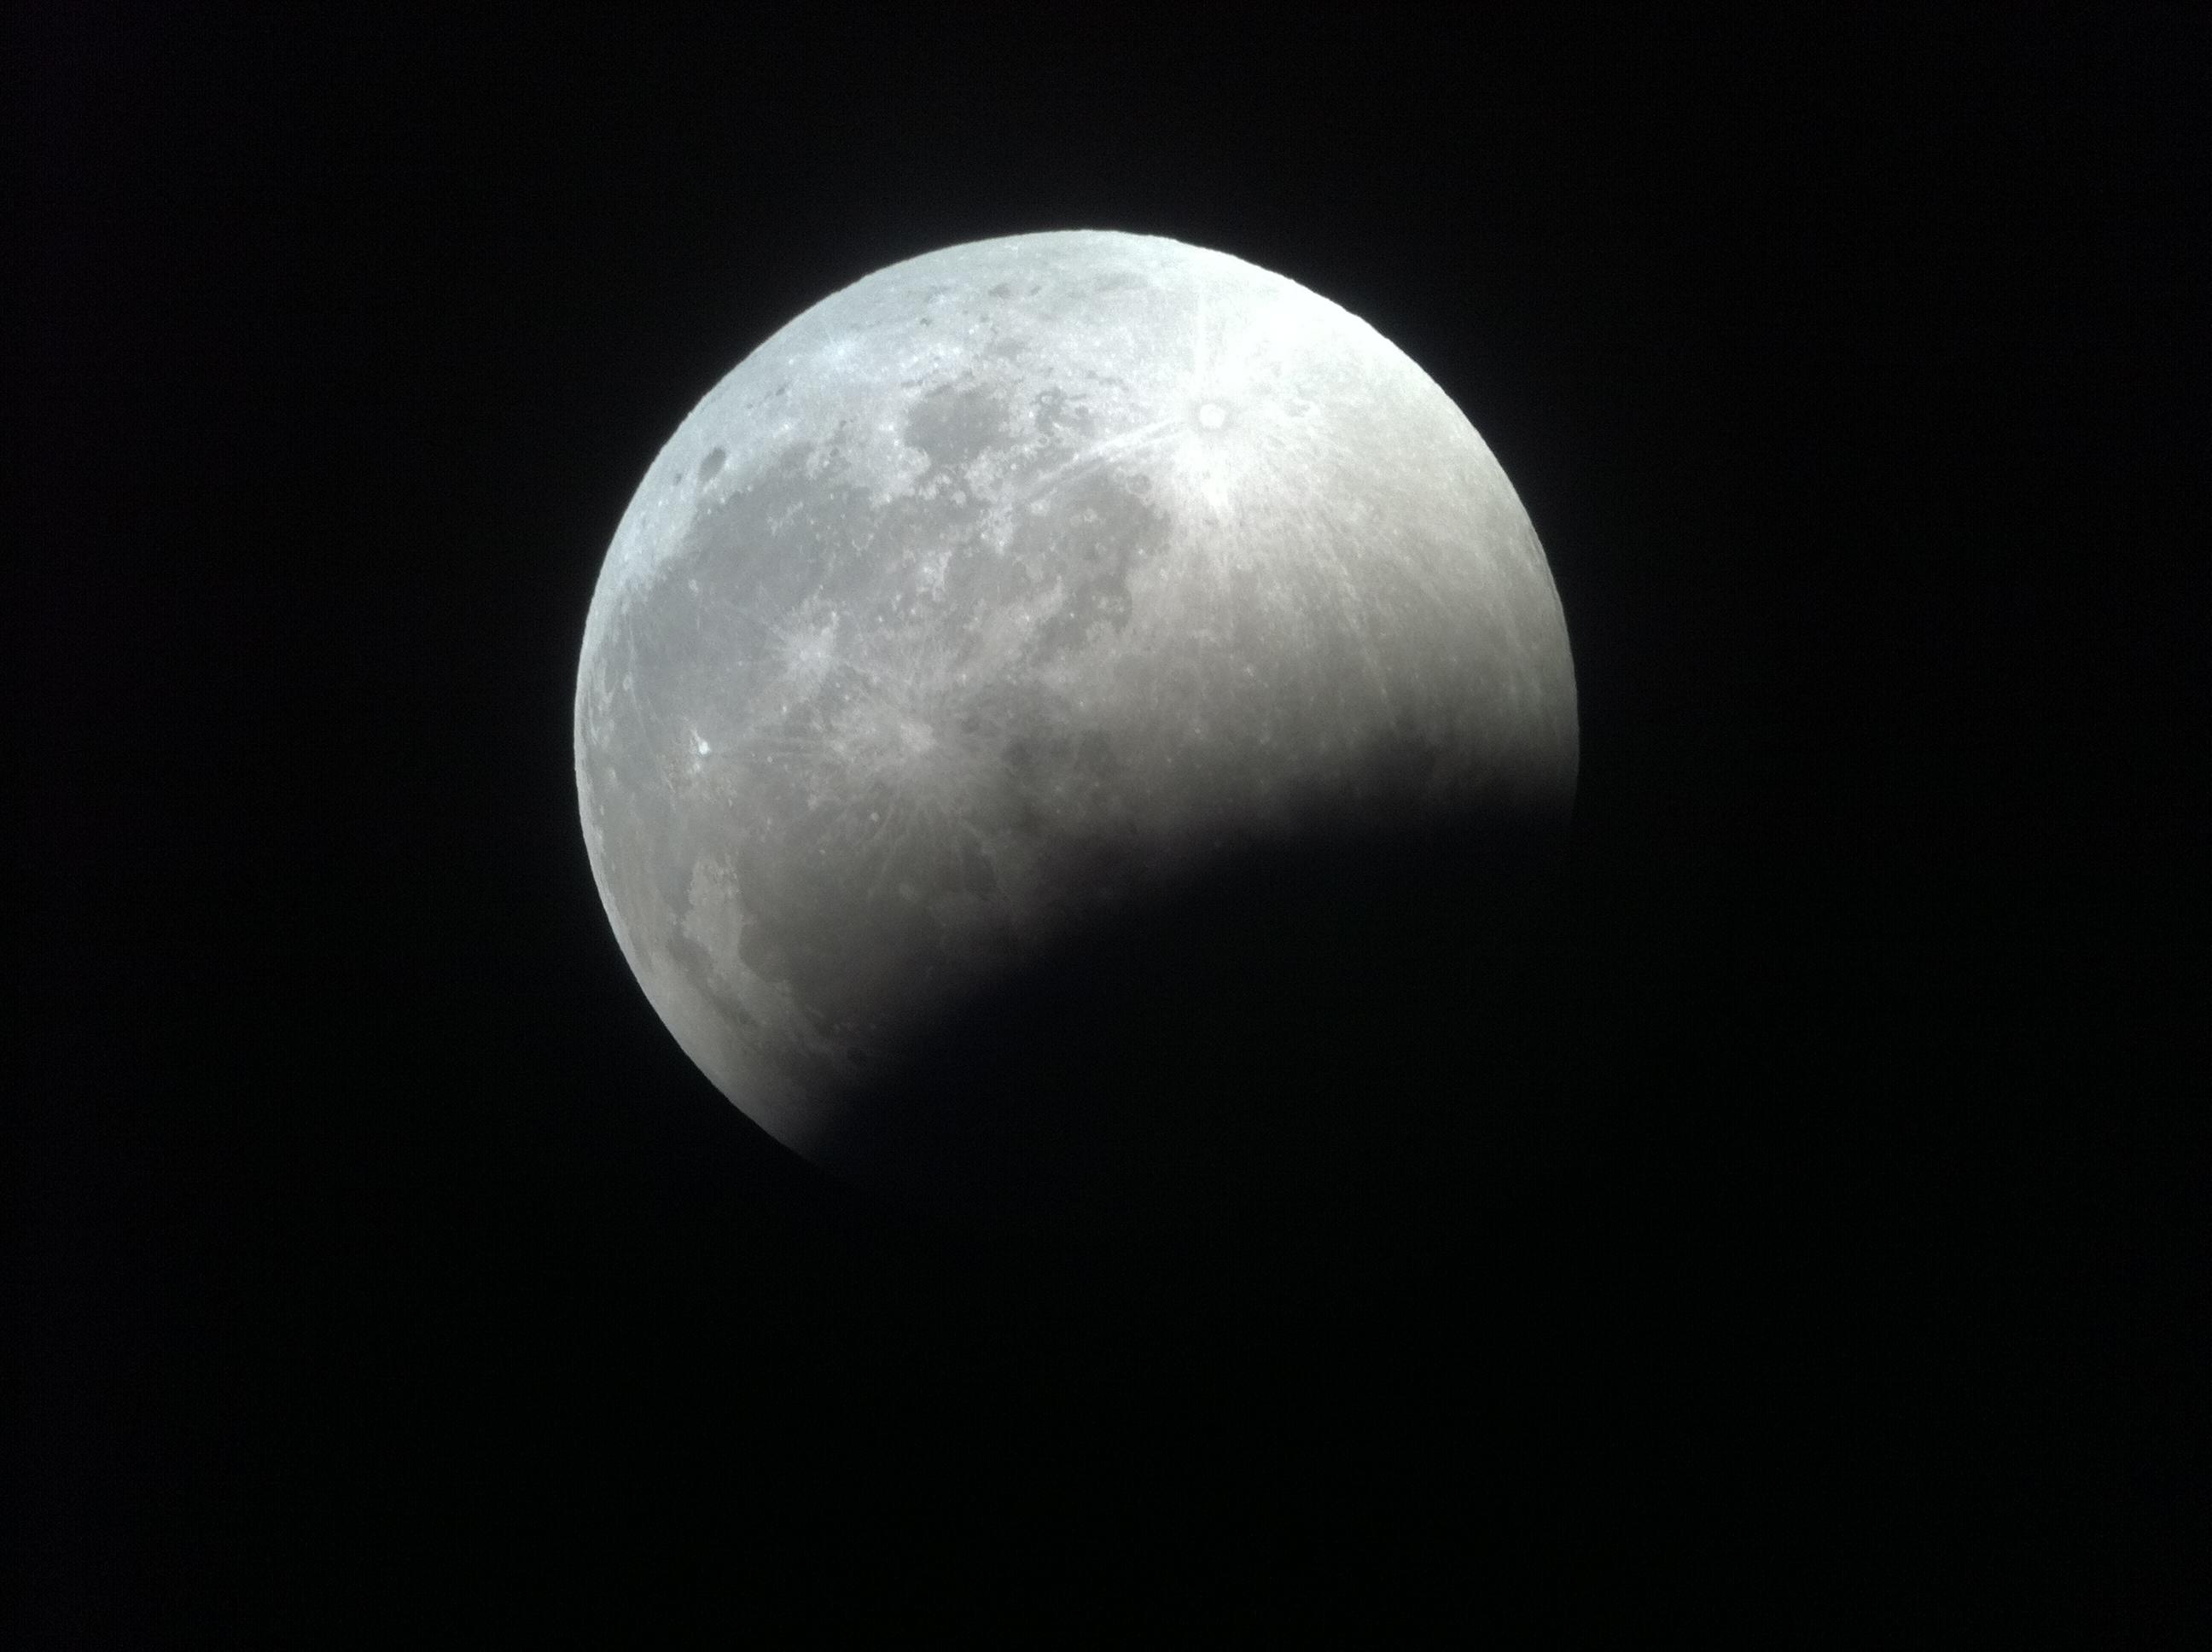 بالصور صور خسوف القمر , صورة واضحه ل خسوف القمر